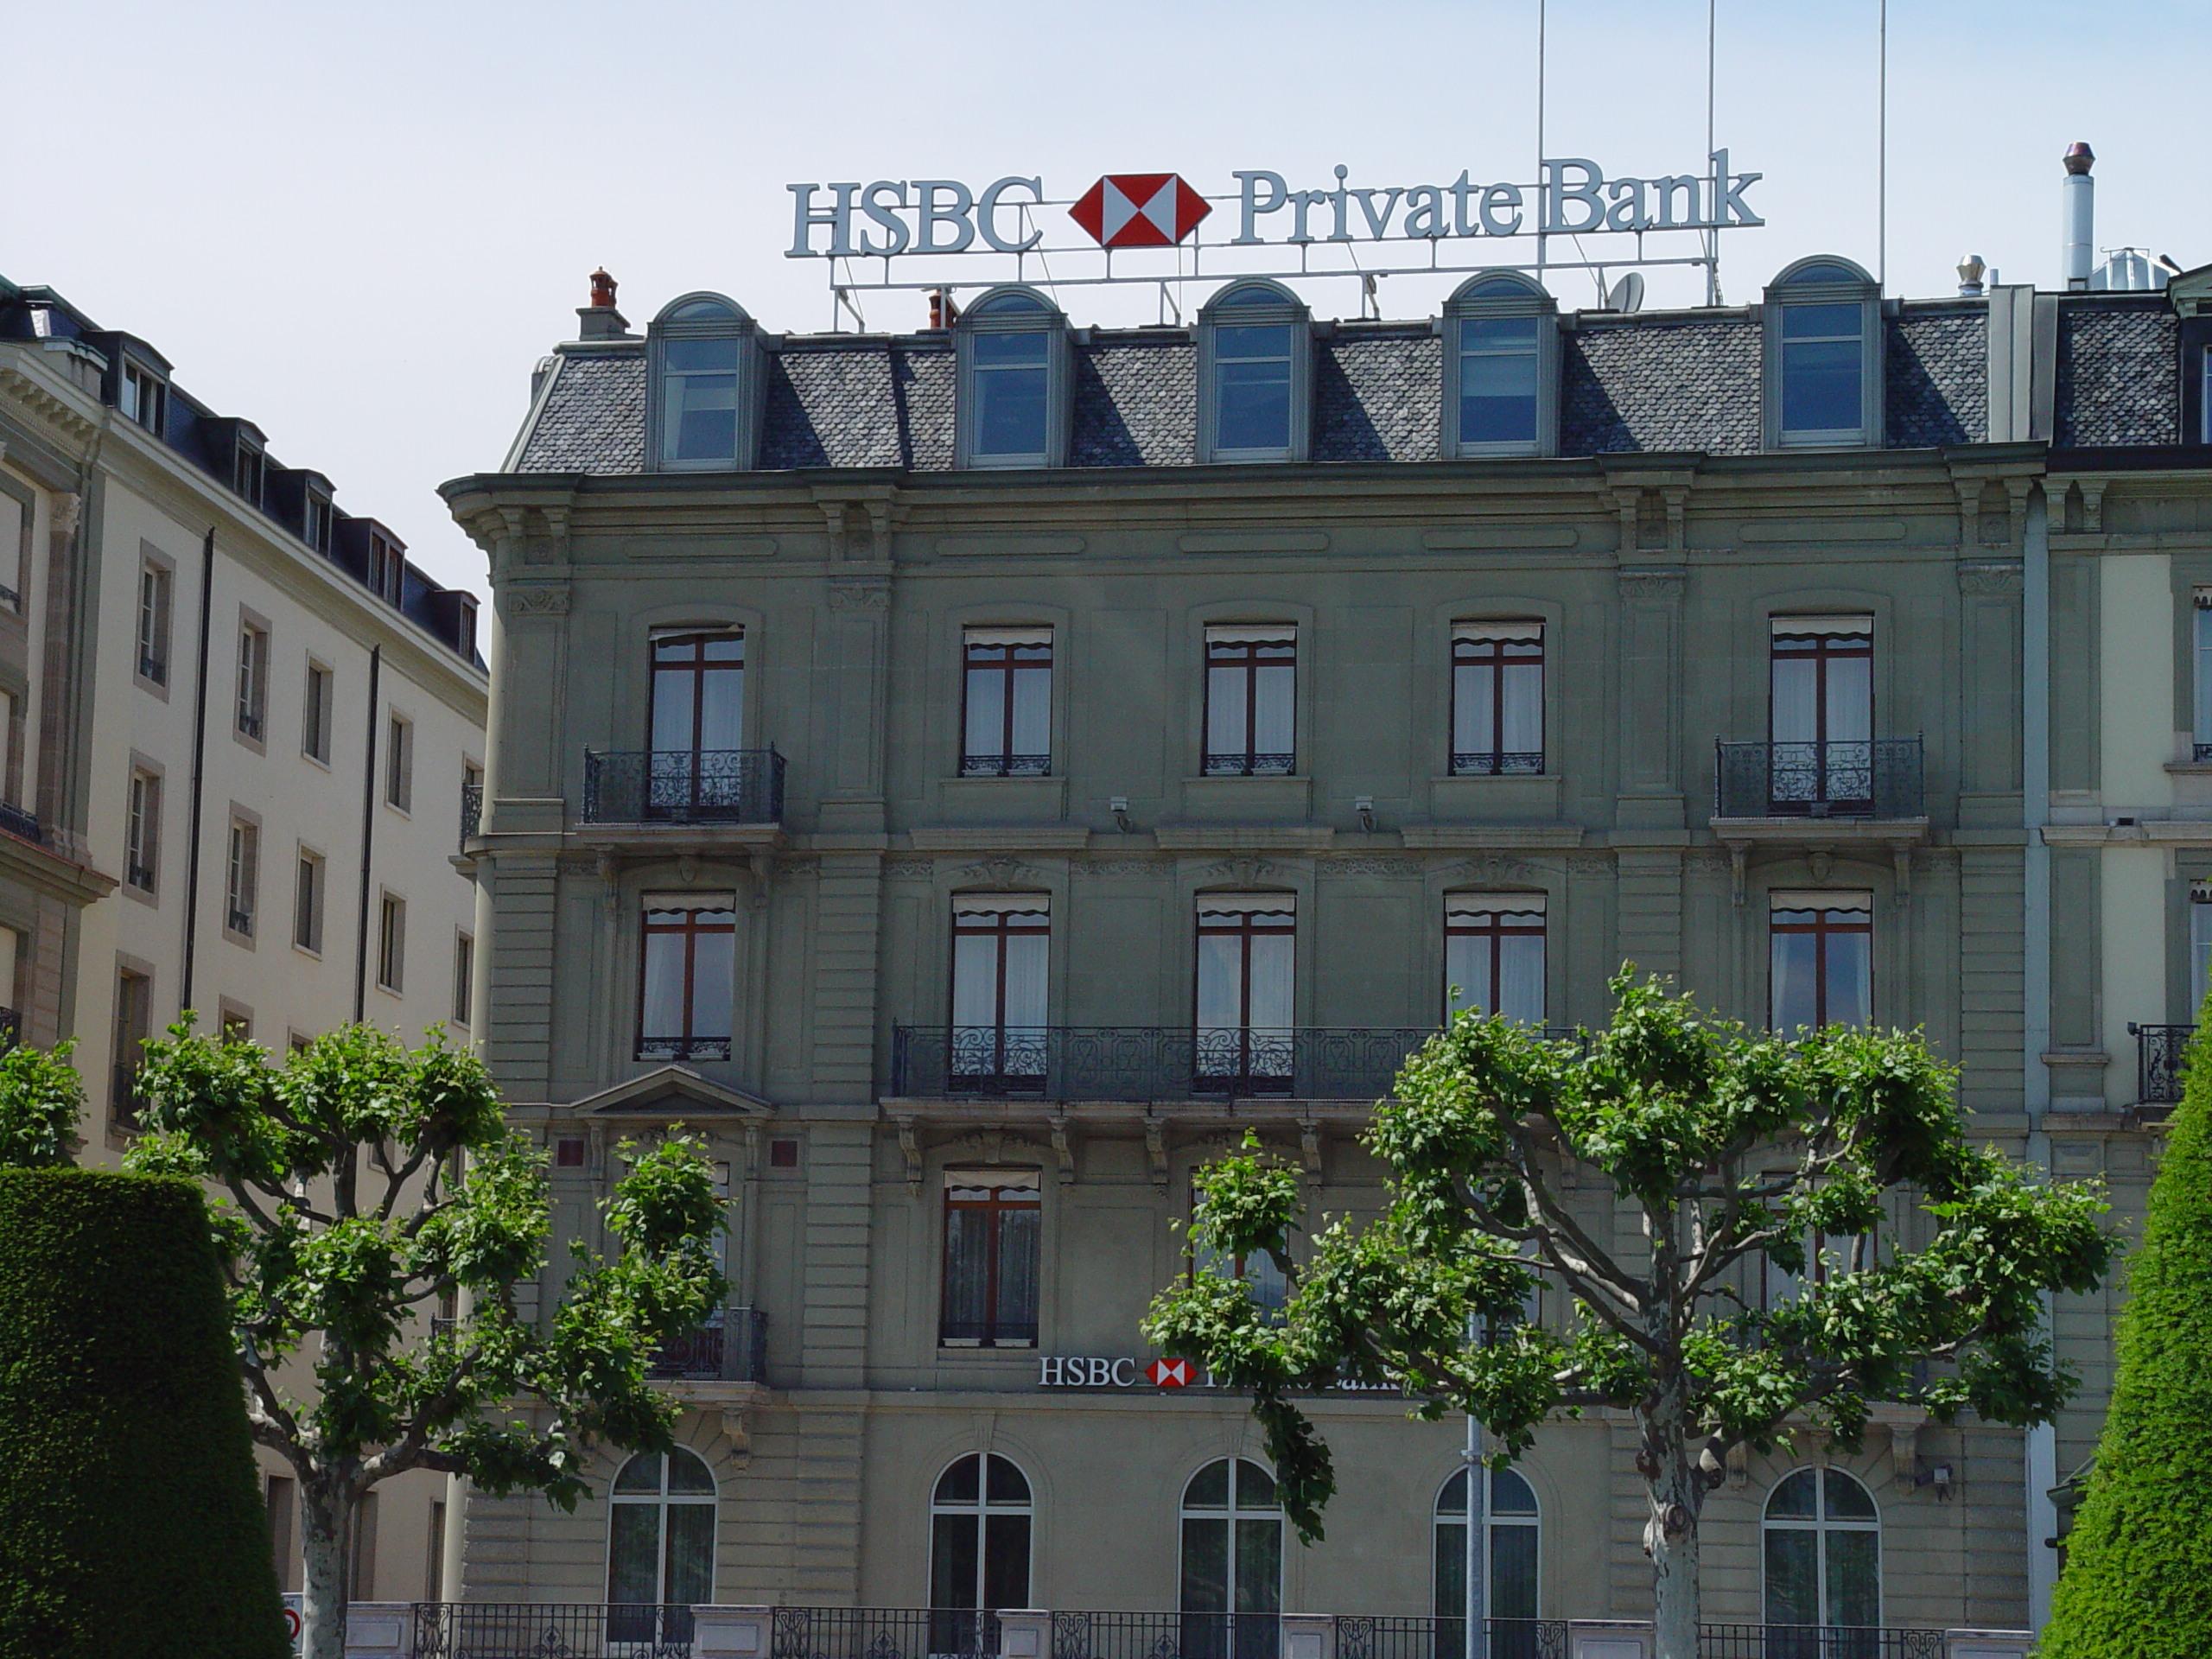 HSBC Private Bank, Geneva. Credit: Beat Strasser/Flickr CC BY-SA 2.0